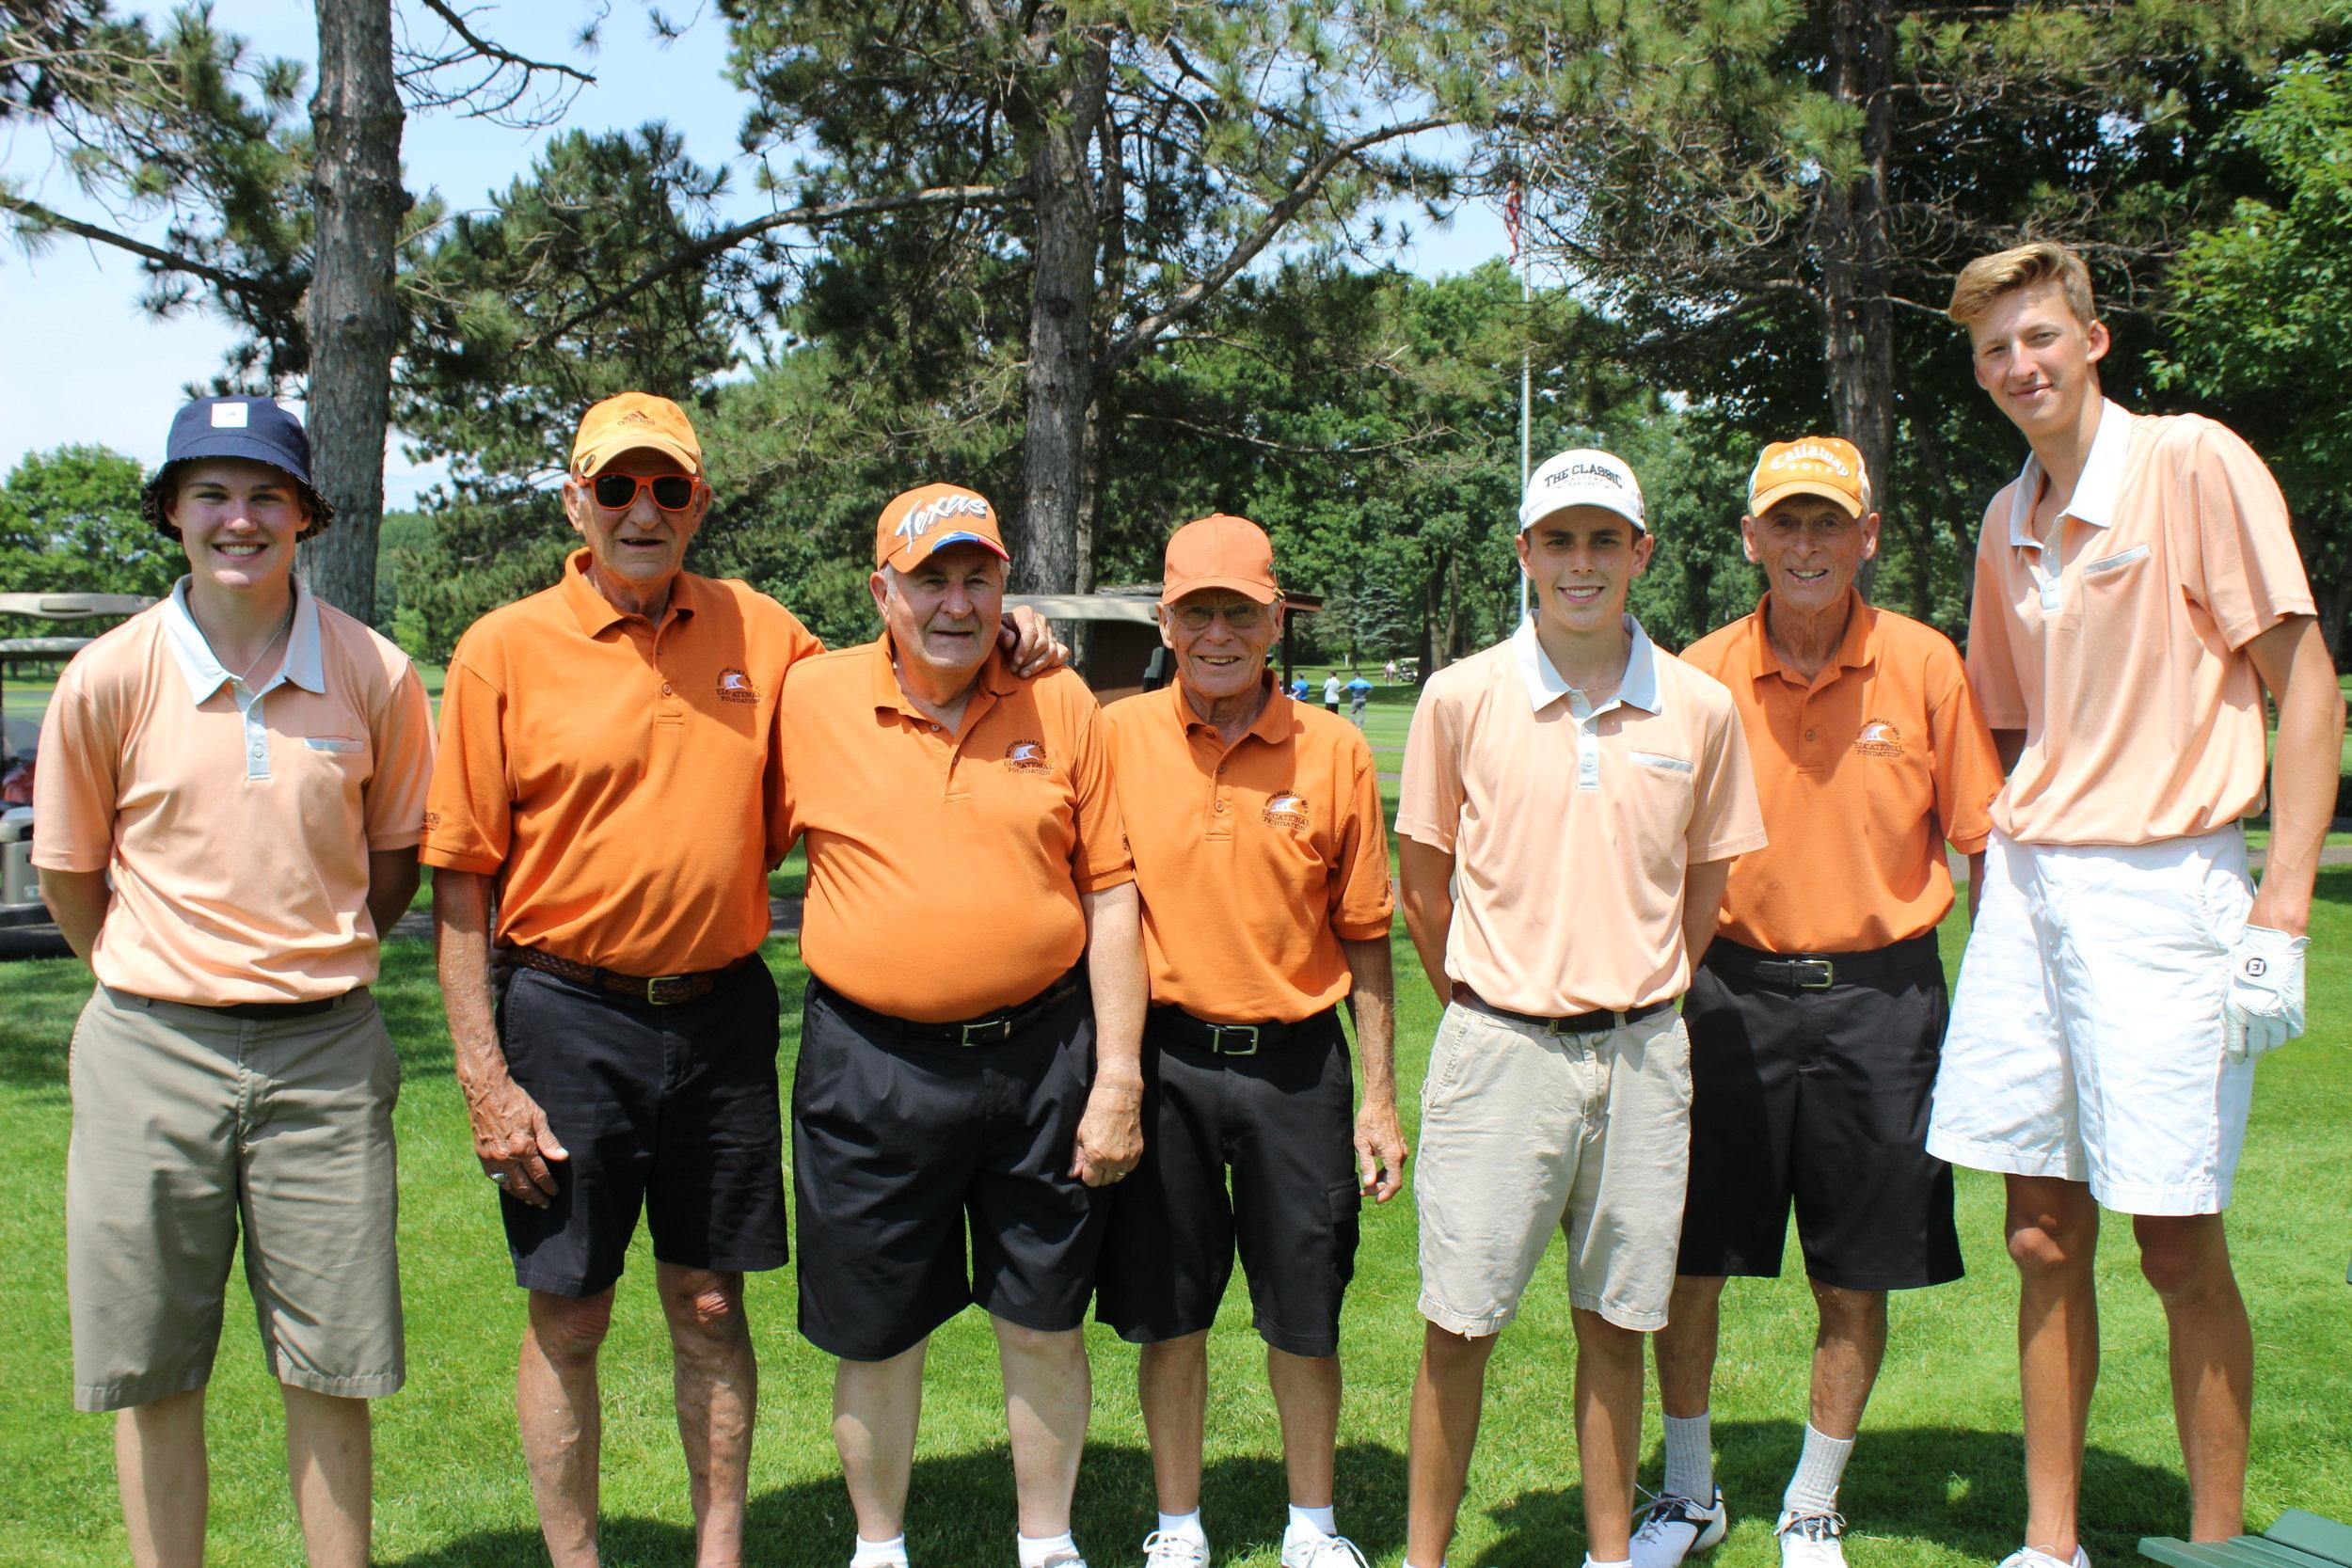 Student Aaren Schmid, Jim Galvin, Myron Rogers, Dick Mackey, Student Jake Paulson, Ron Nelson, Student Gabe Rensenbrink(1).jpg